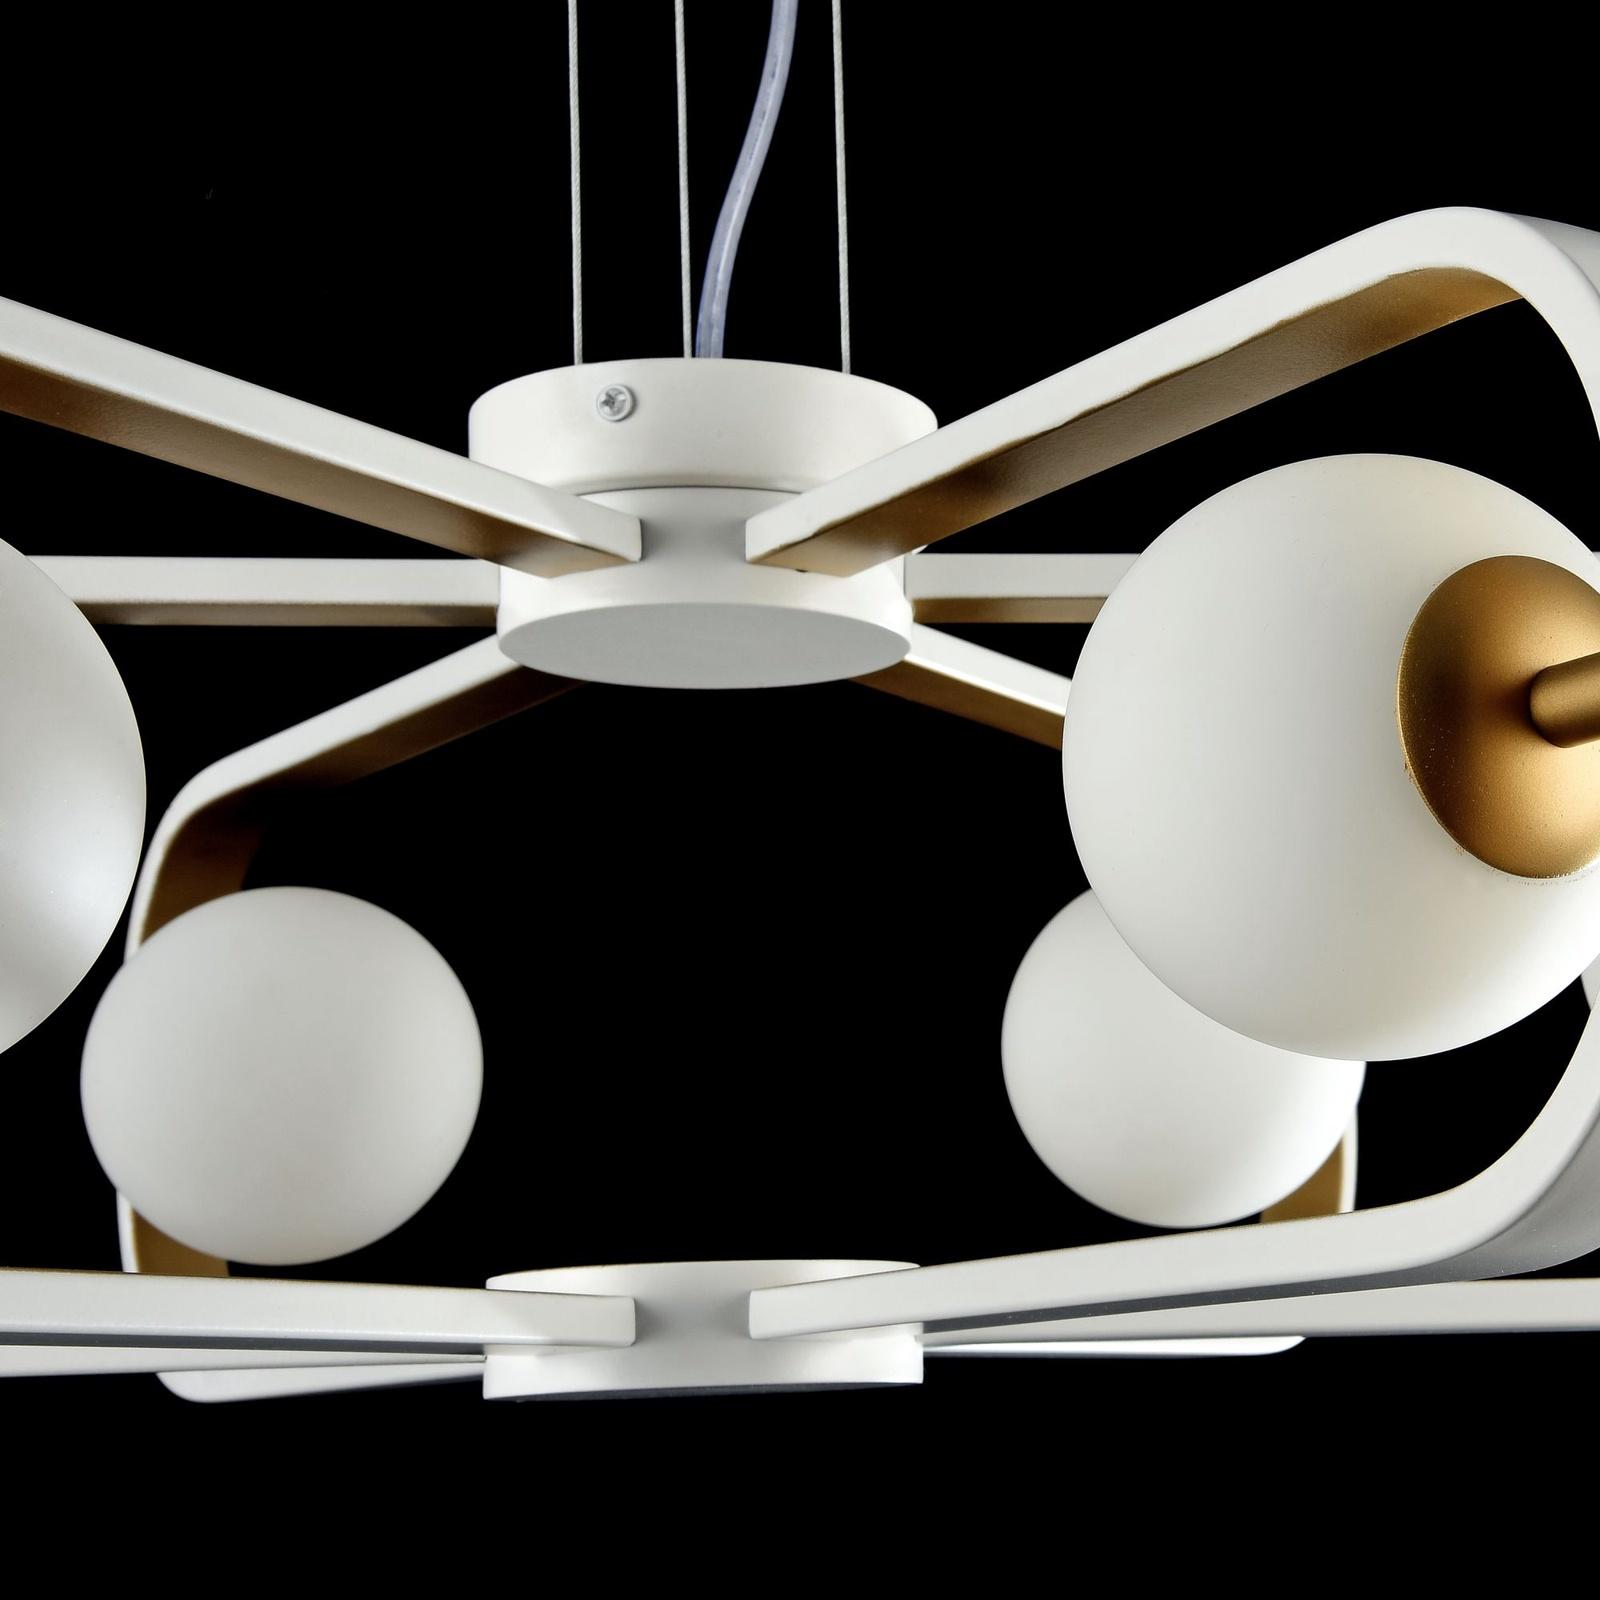 Потолочный светильник Maytoni MOD431-PL-06-WG цена